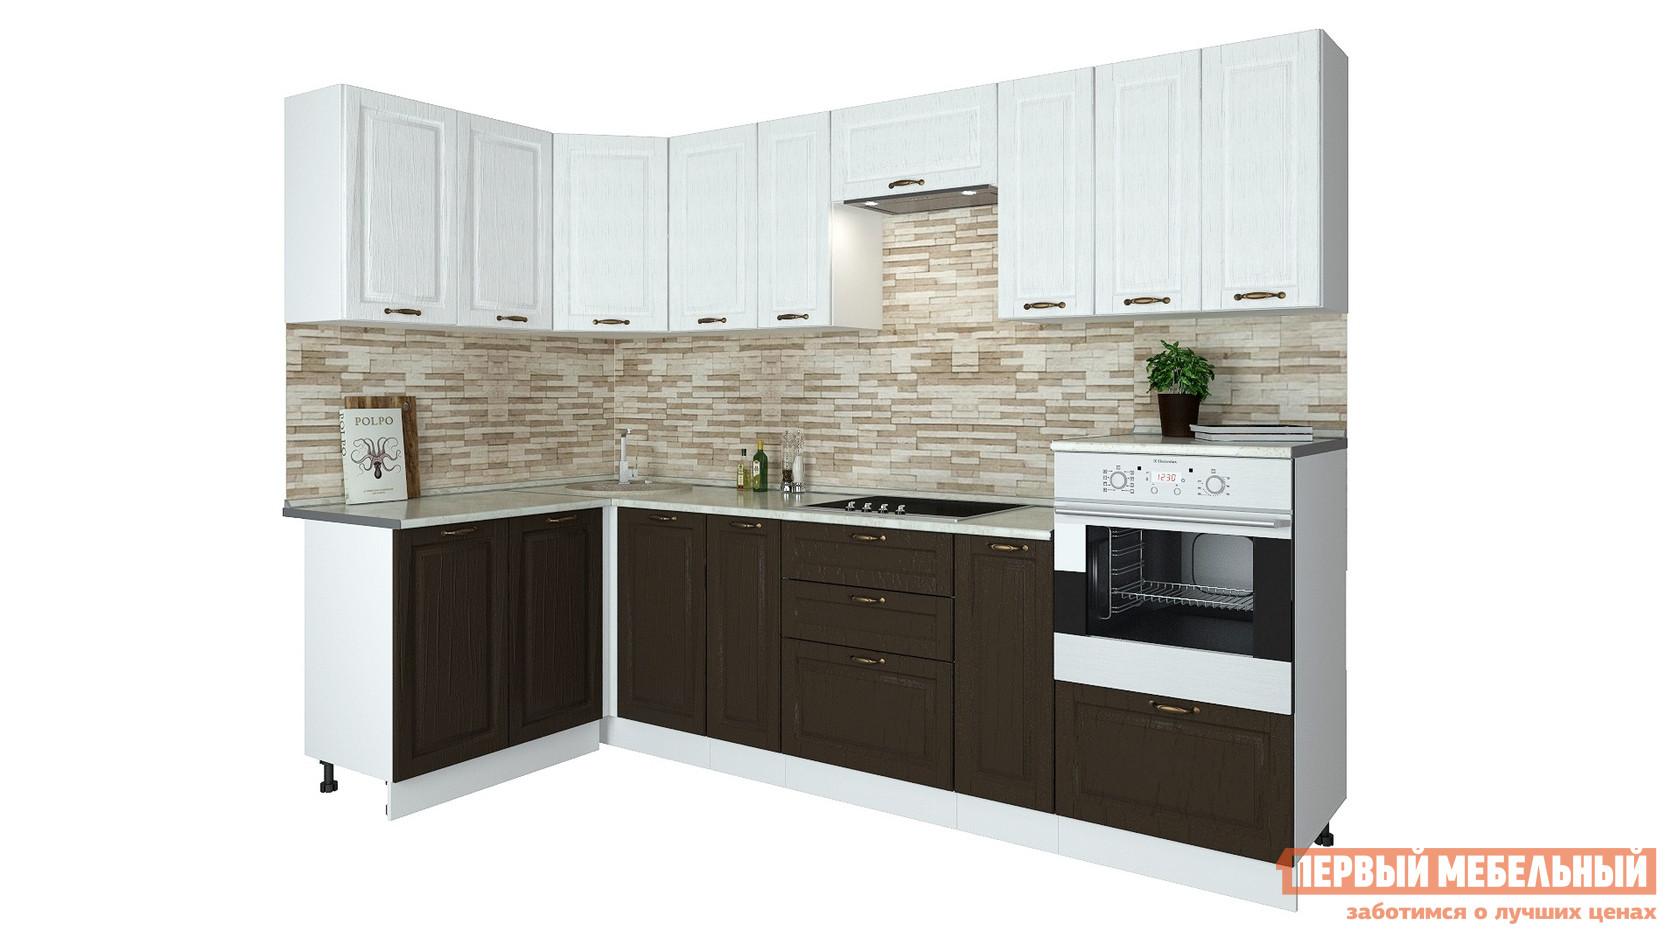 Угловой кухонный гарнитур Первый Мебельный Кухня Палермо 2,8х1,4 м